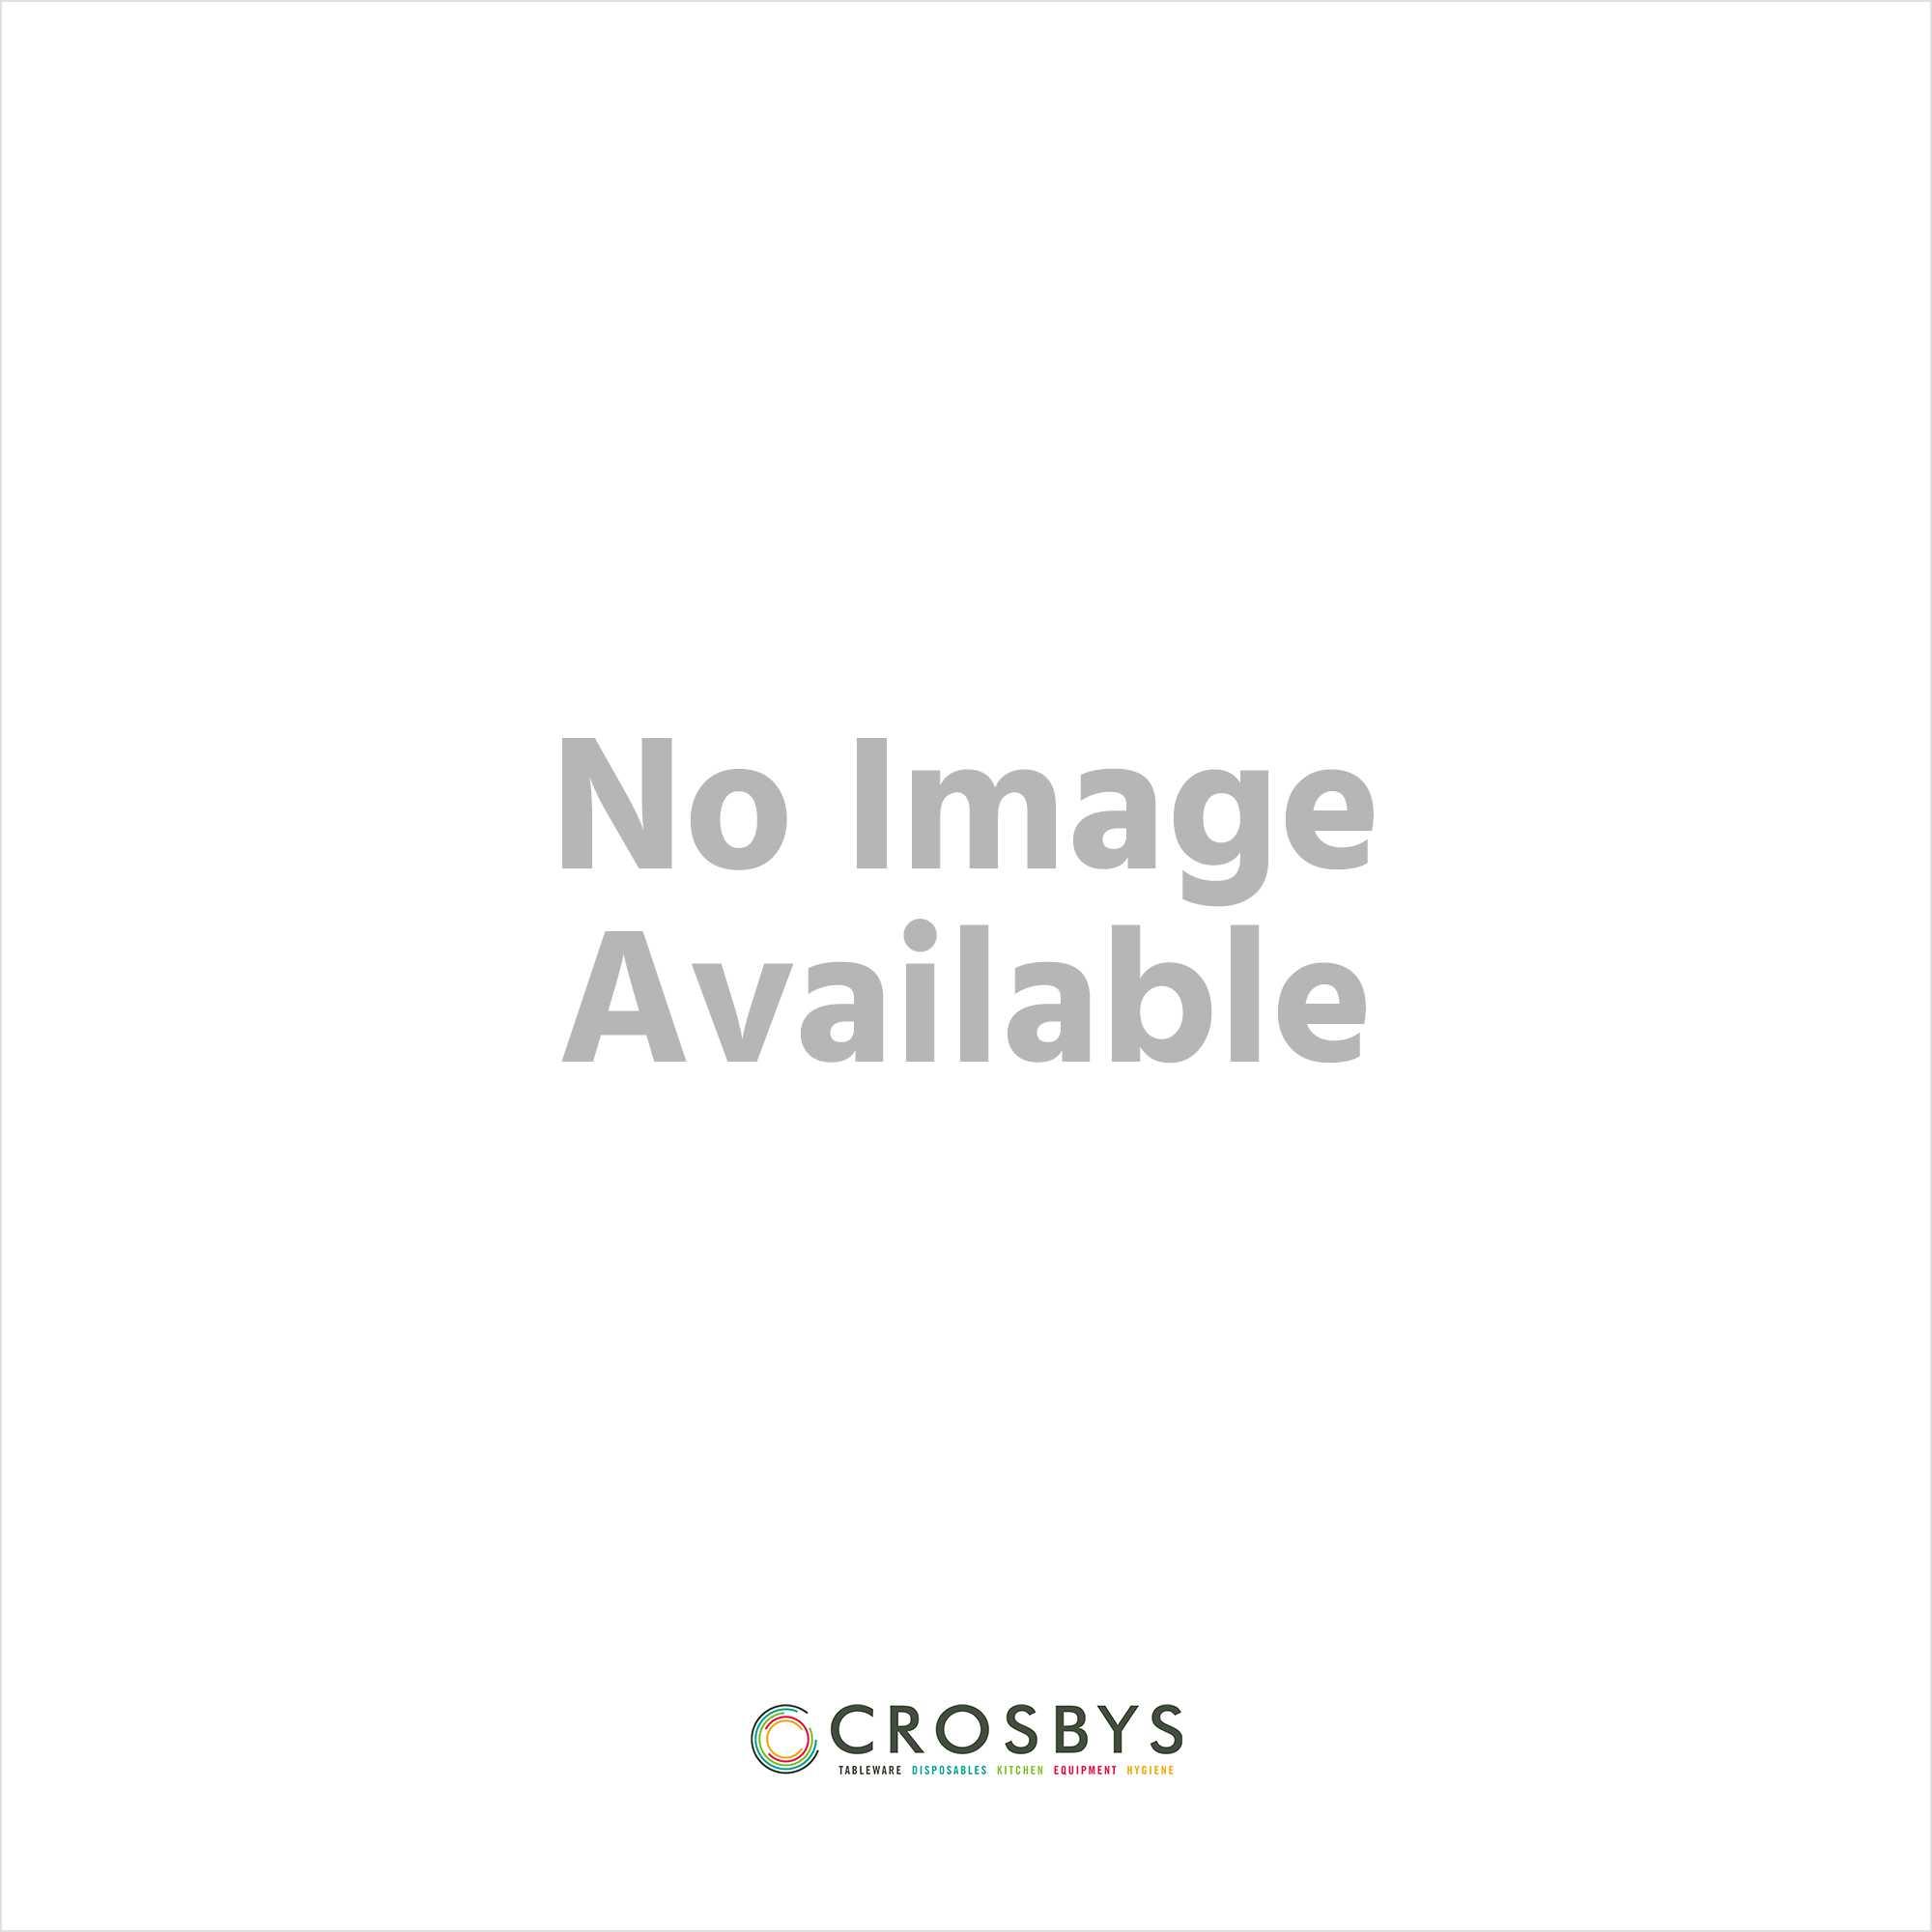 Genware GenWare Thermobox GN 1/1 Frontloader 93Litre